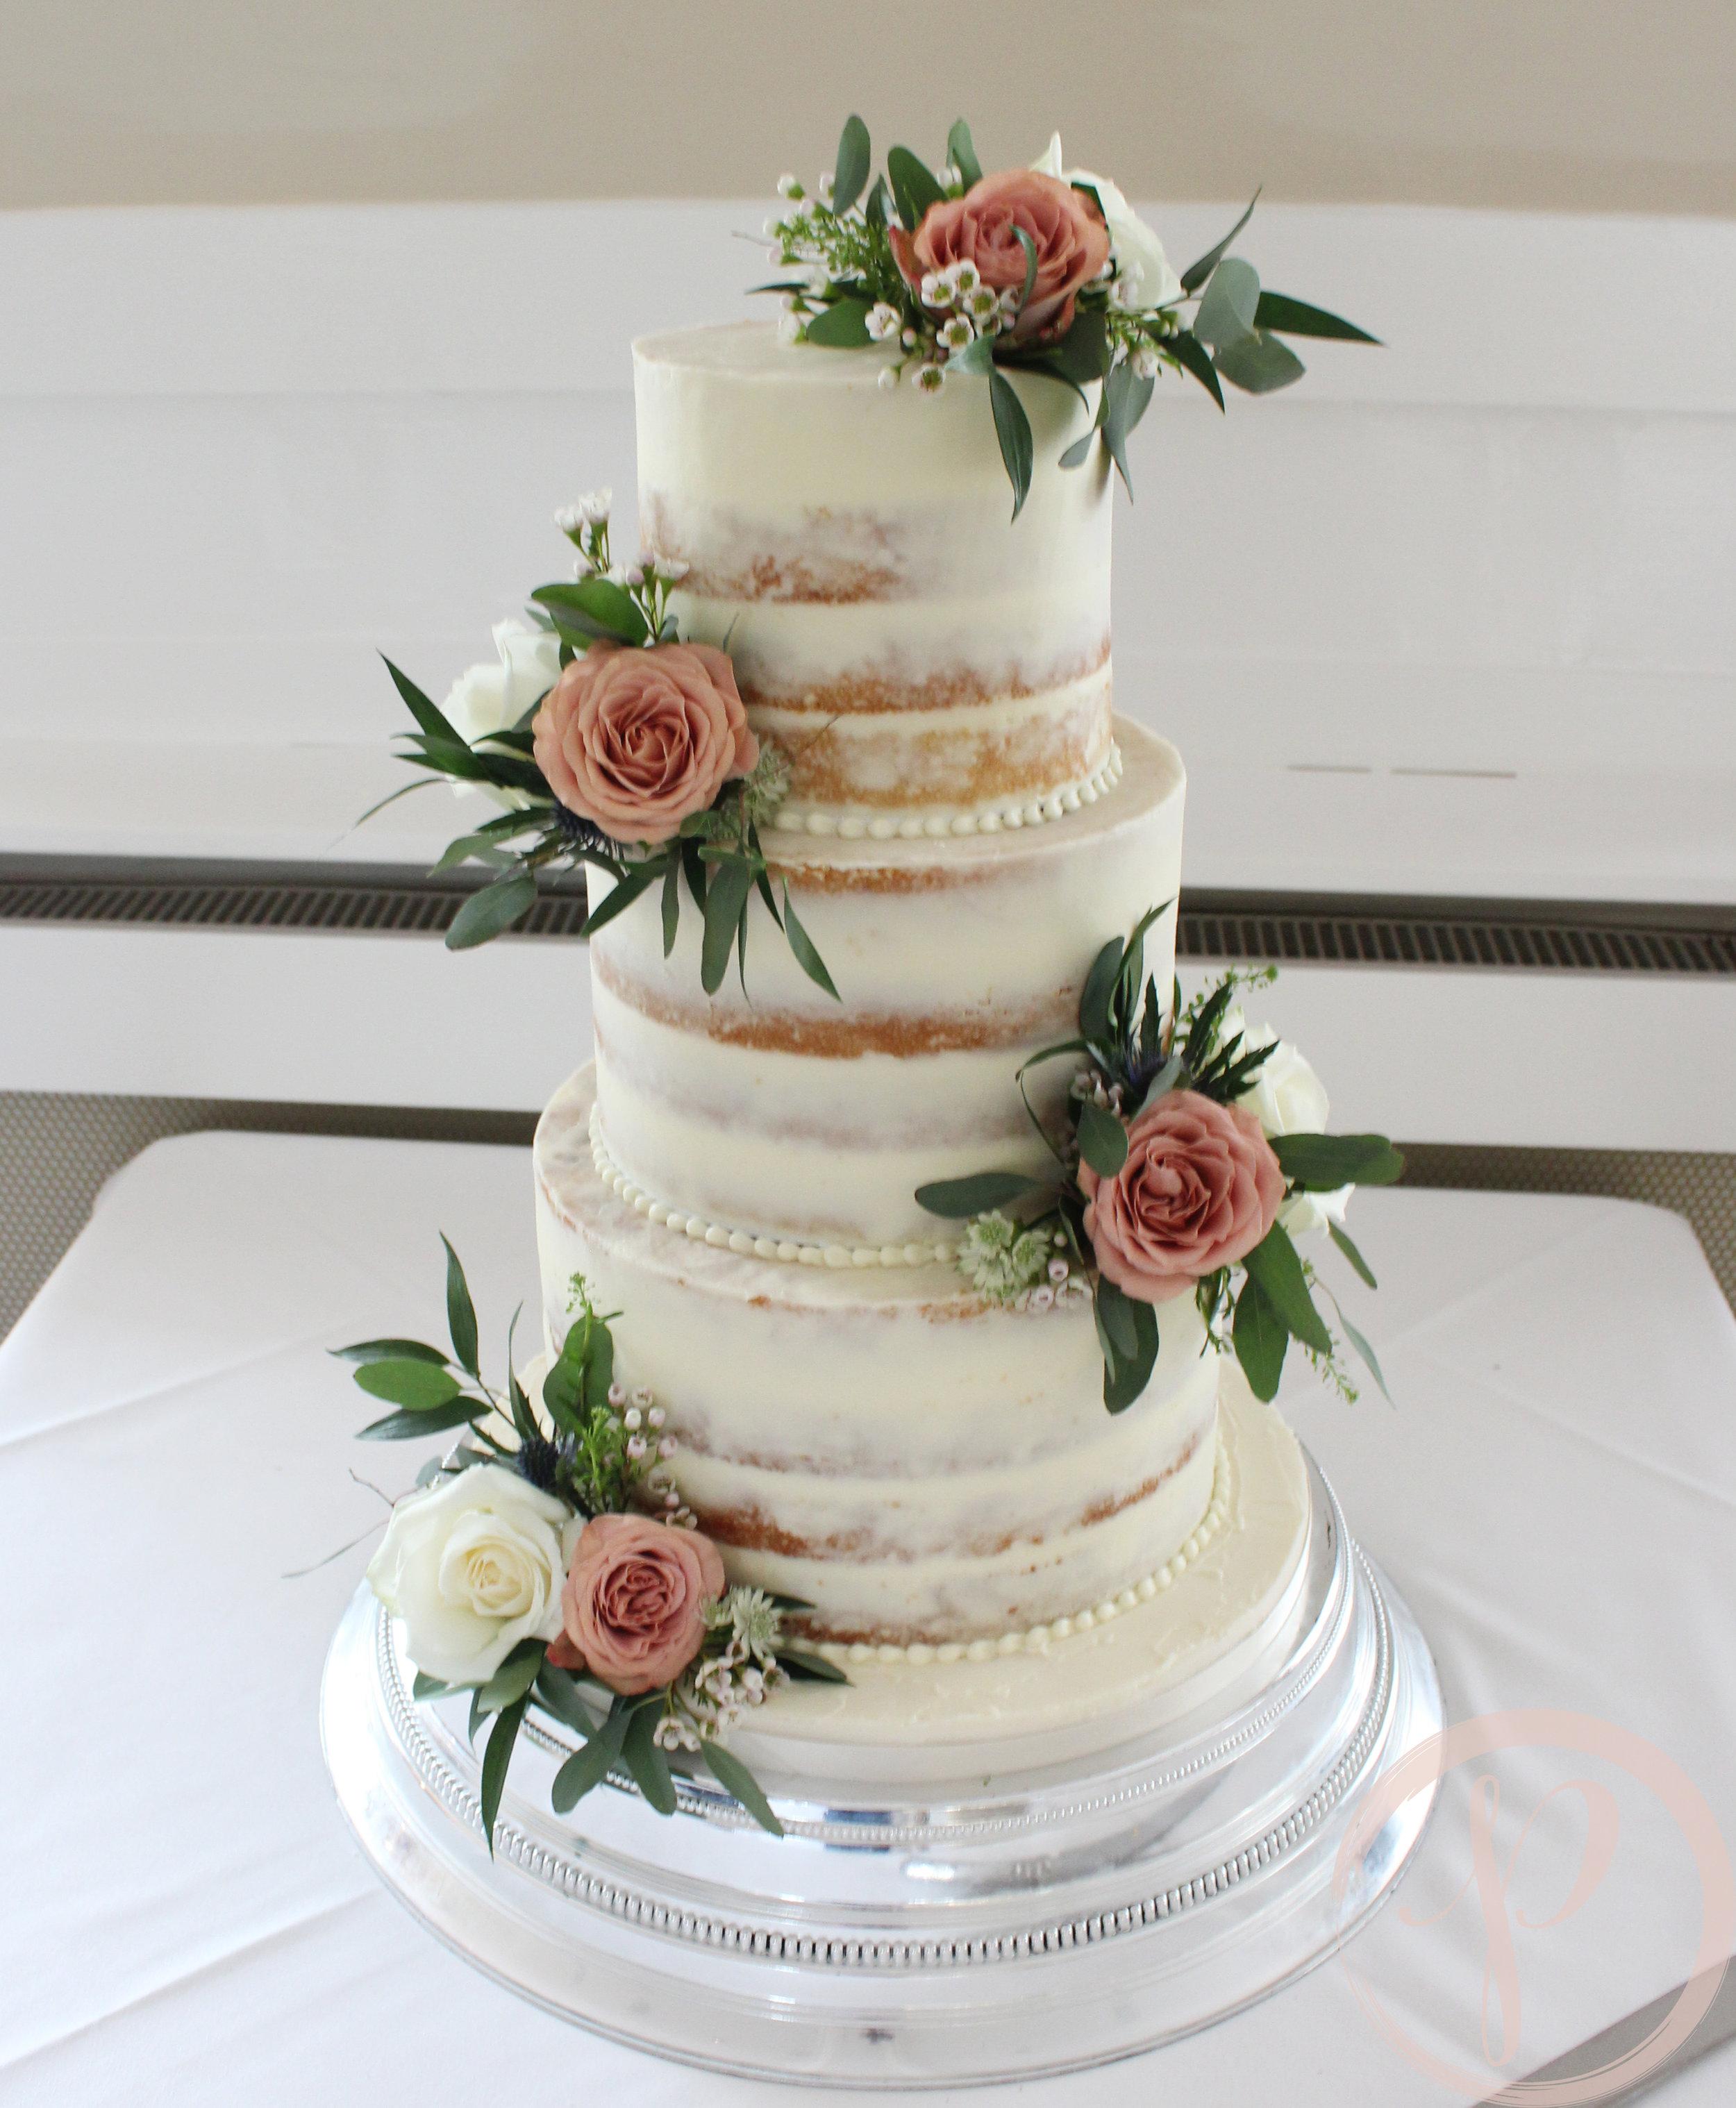 semi naked wedding cake cappucino roses.jpg